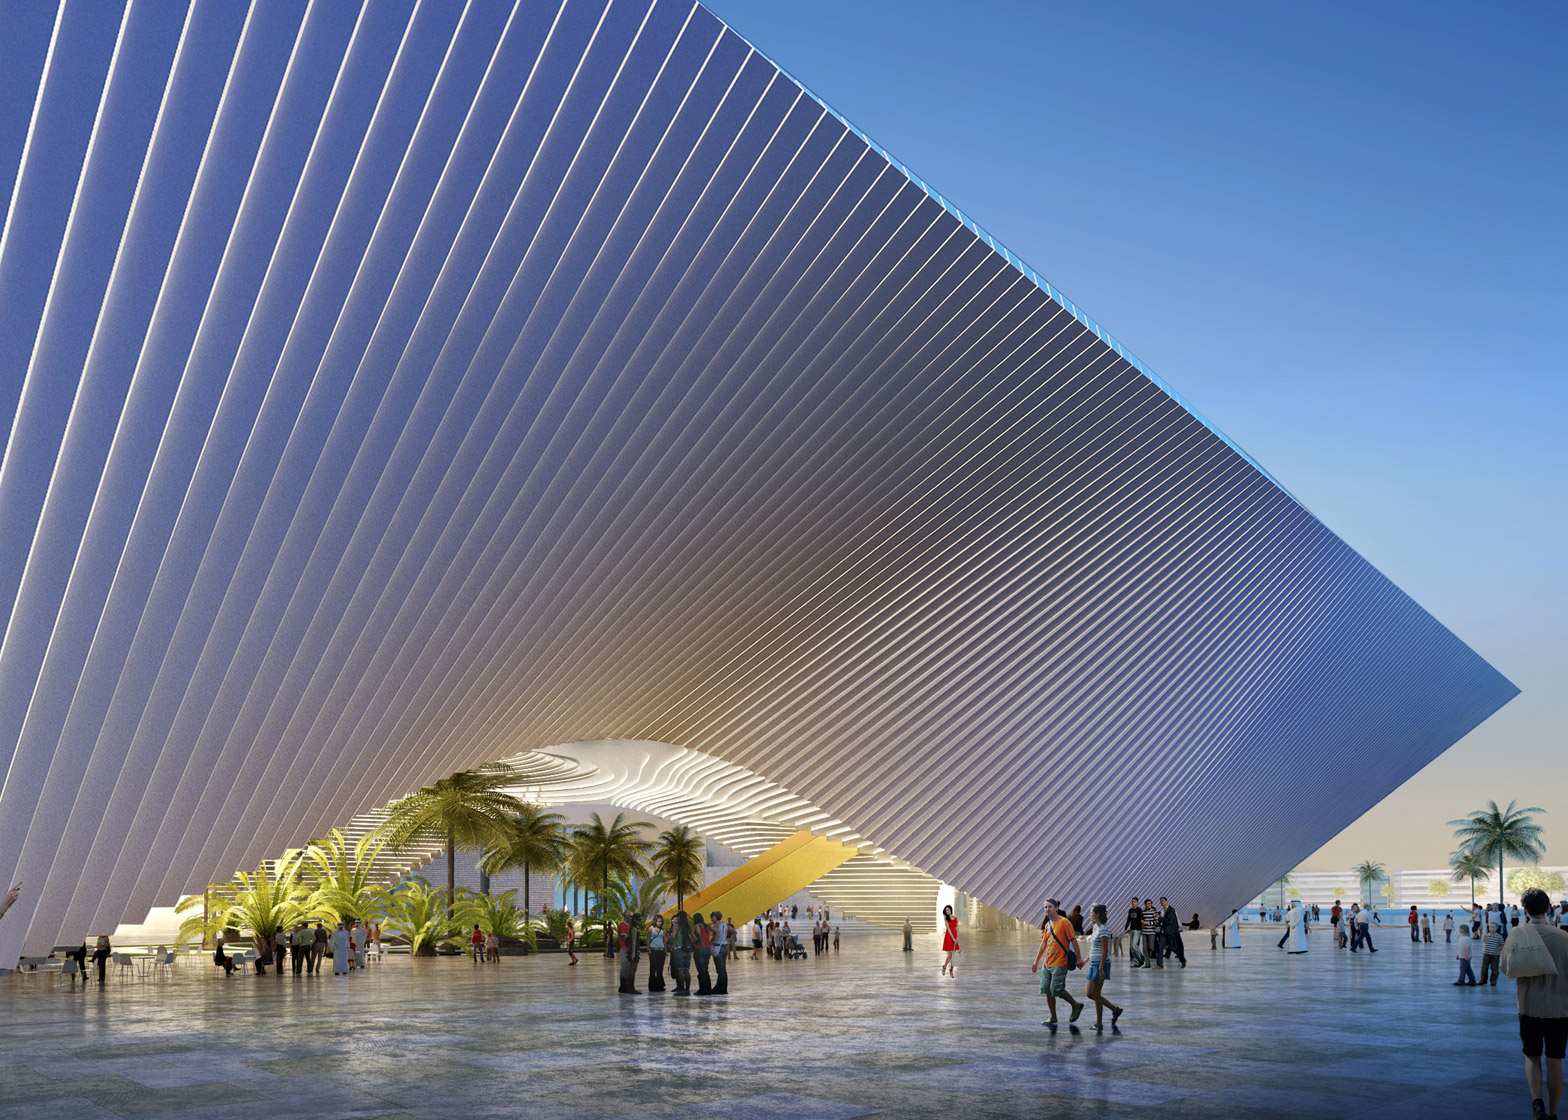 2020 Expo Dubai Pavilions E Architect